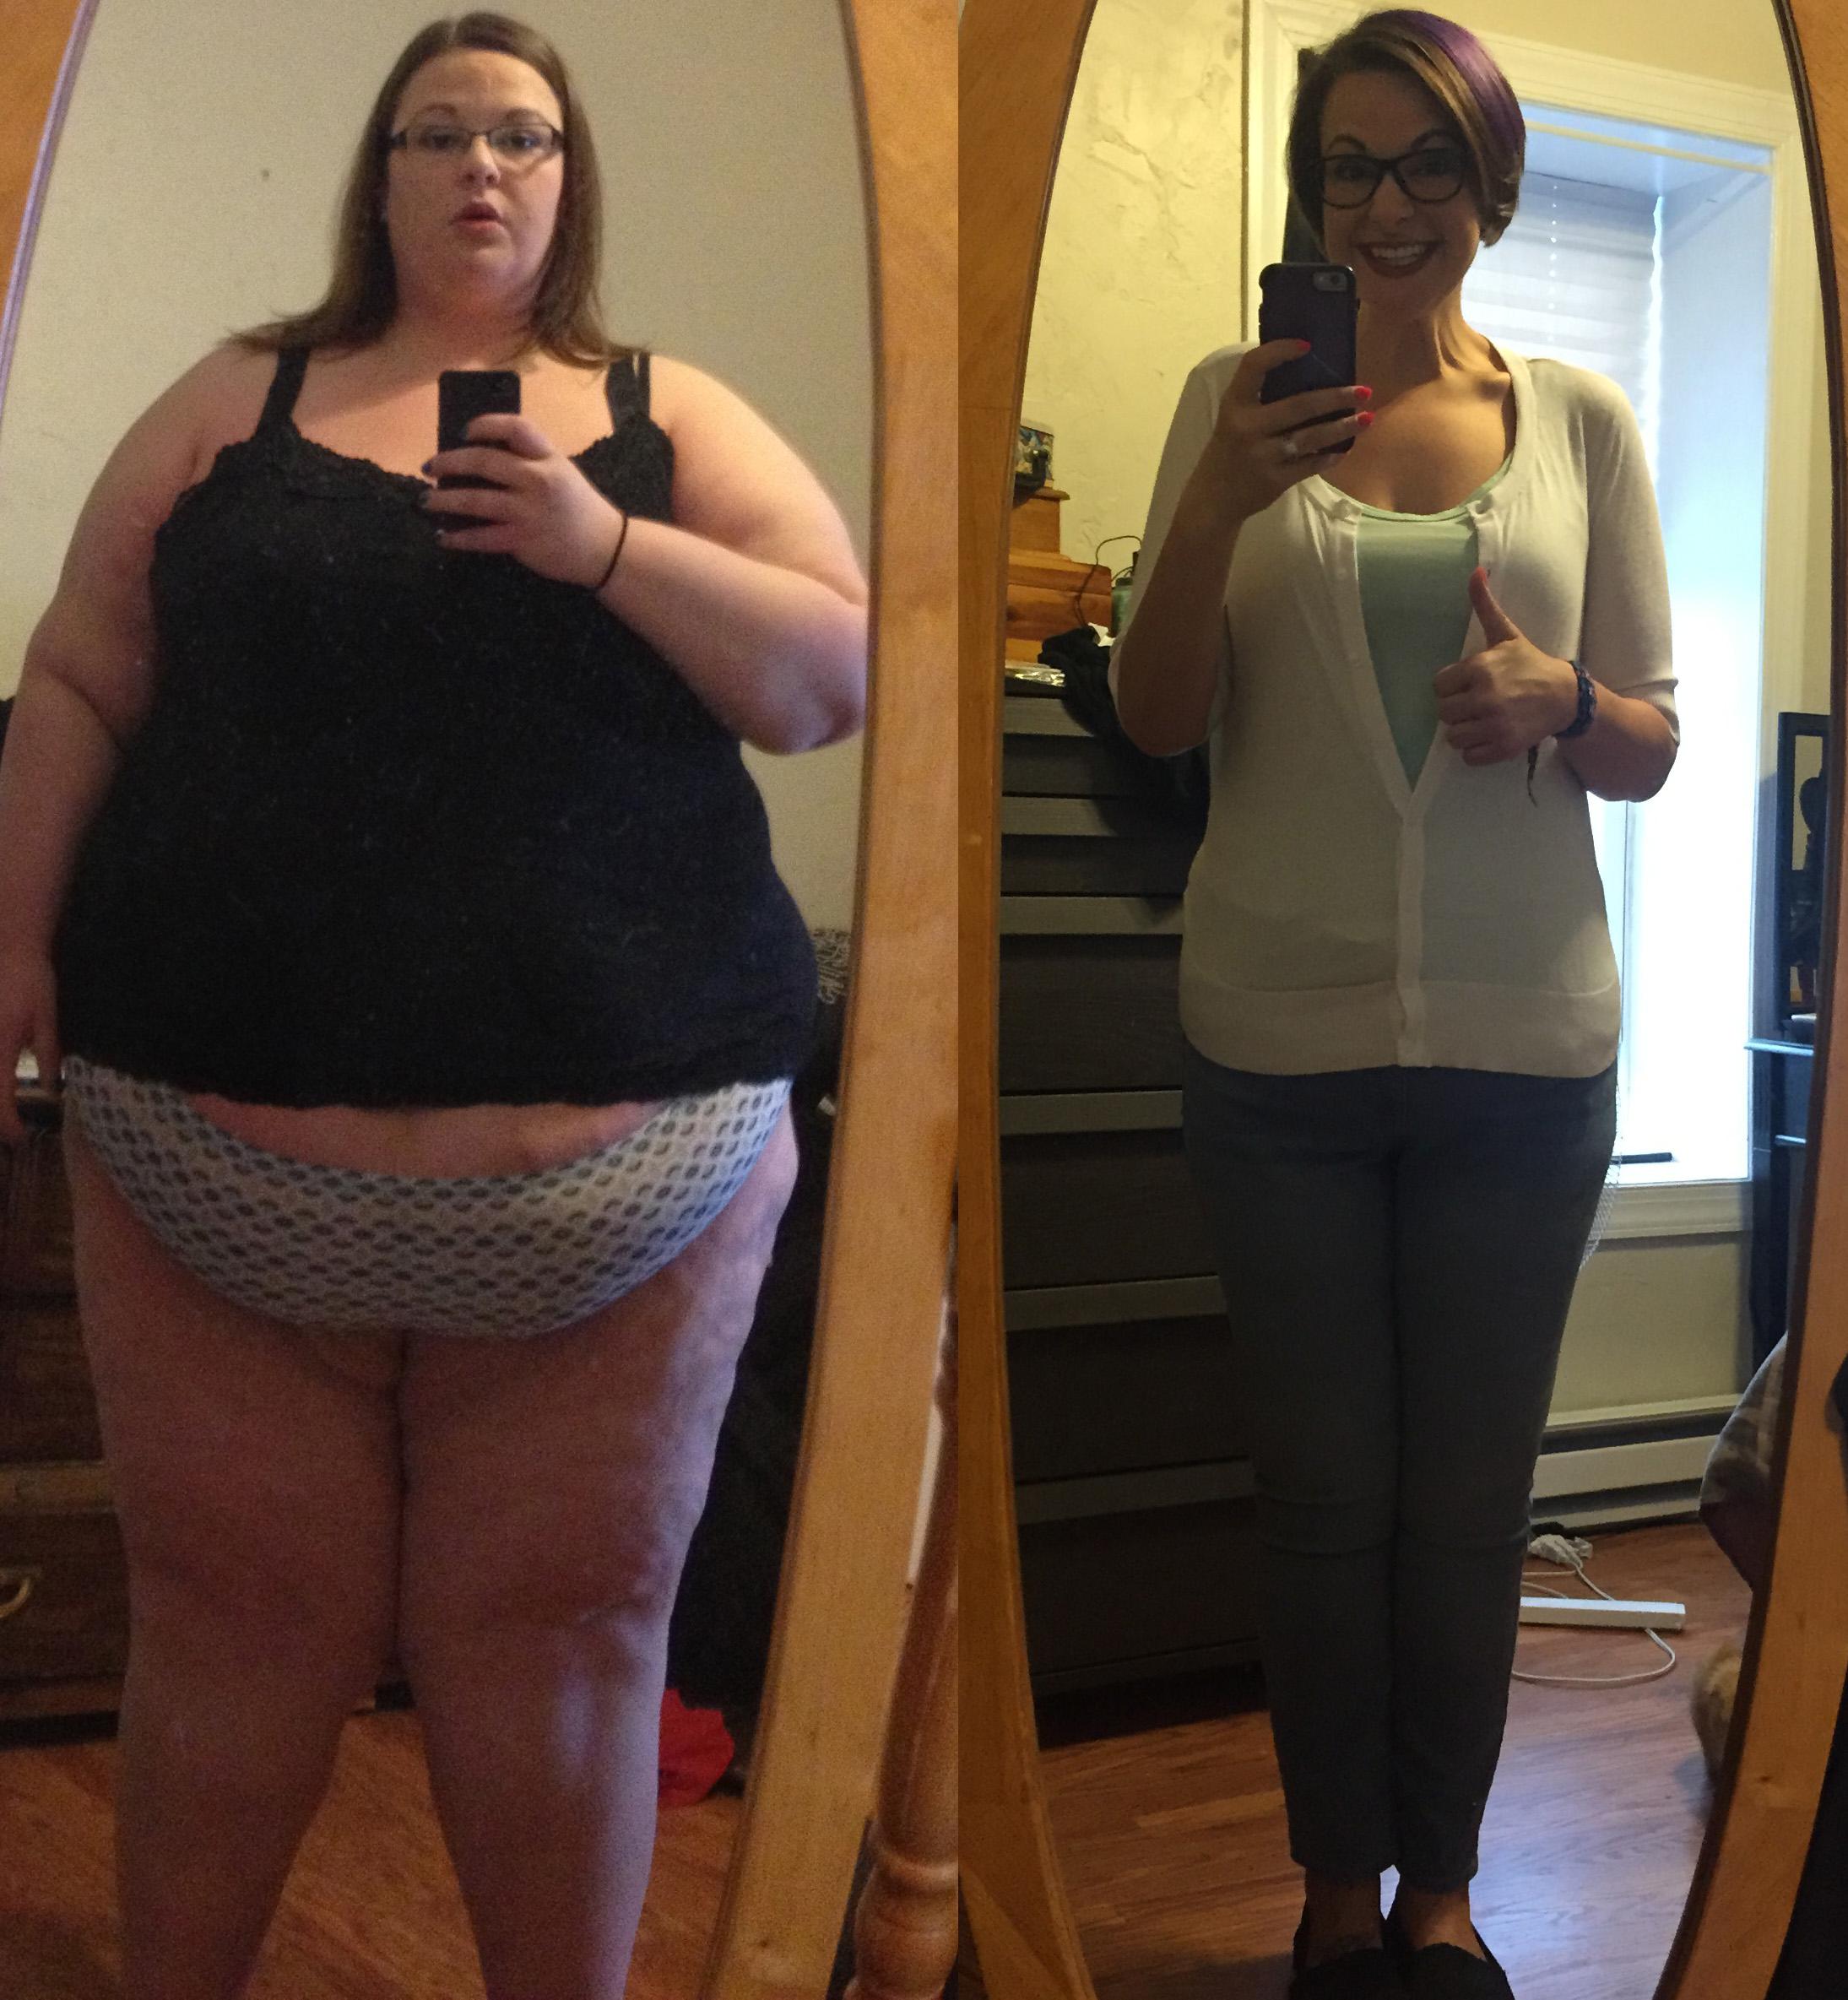 hogyan lehet kövér nőstényt égetni